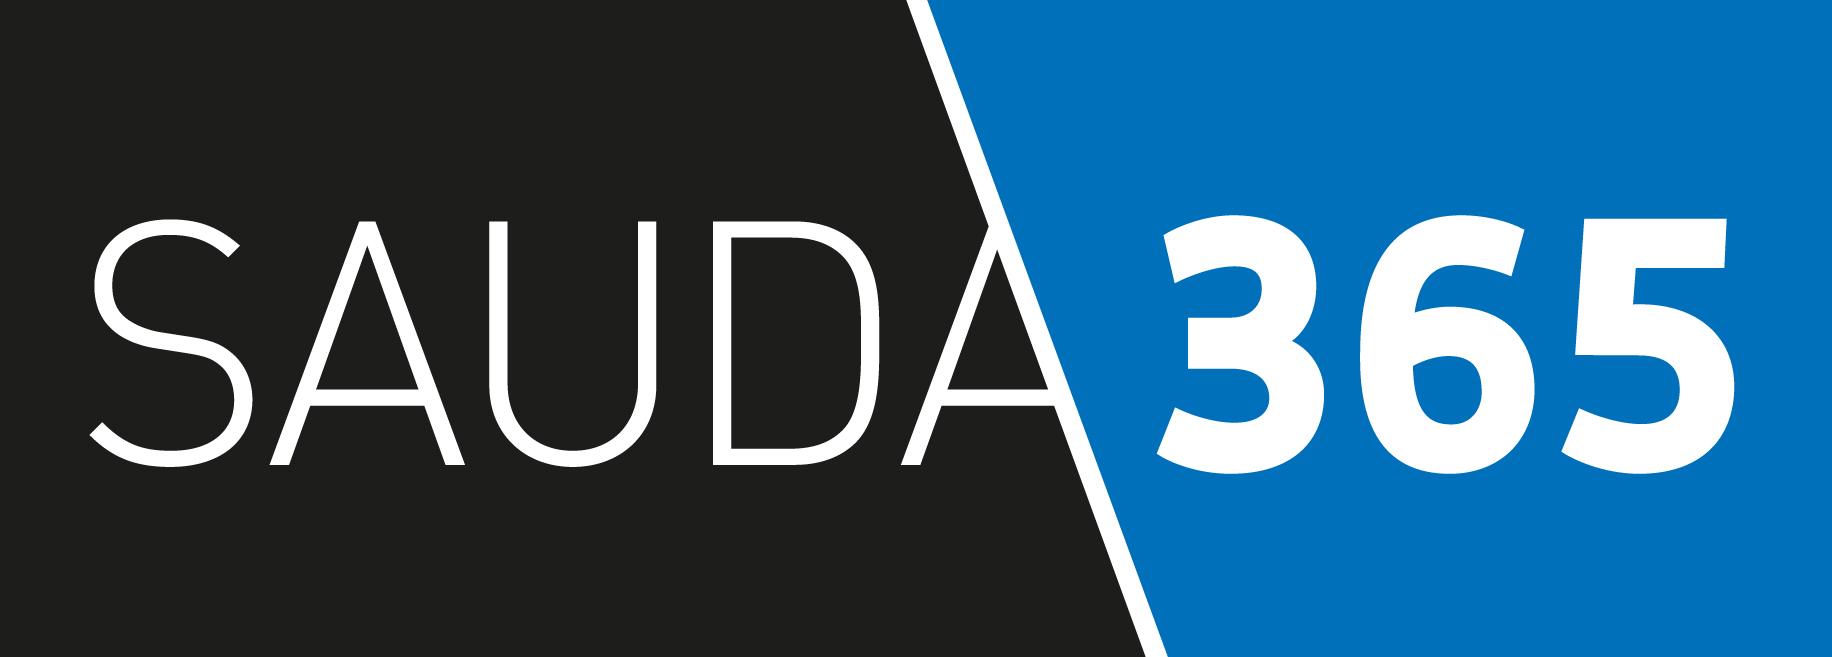 Sauda 365 logo